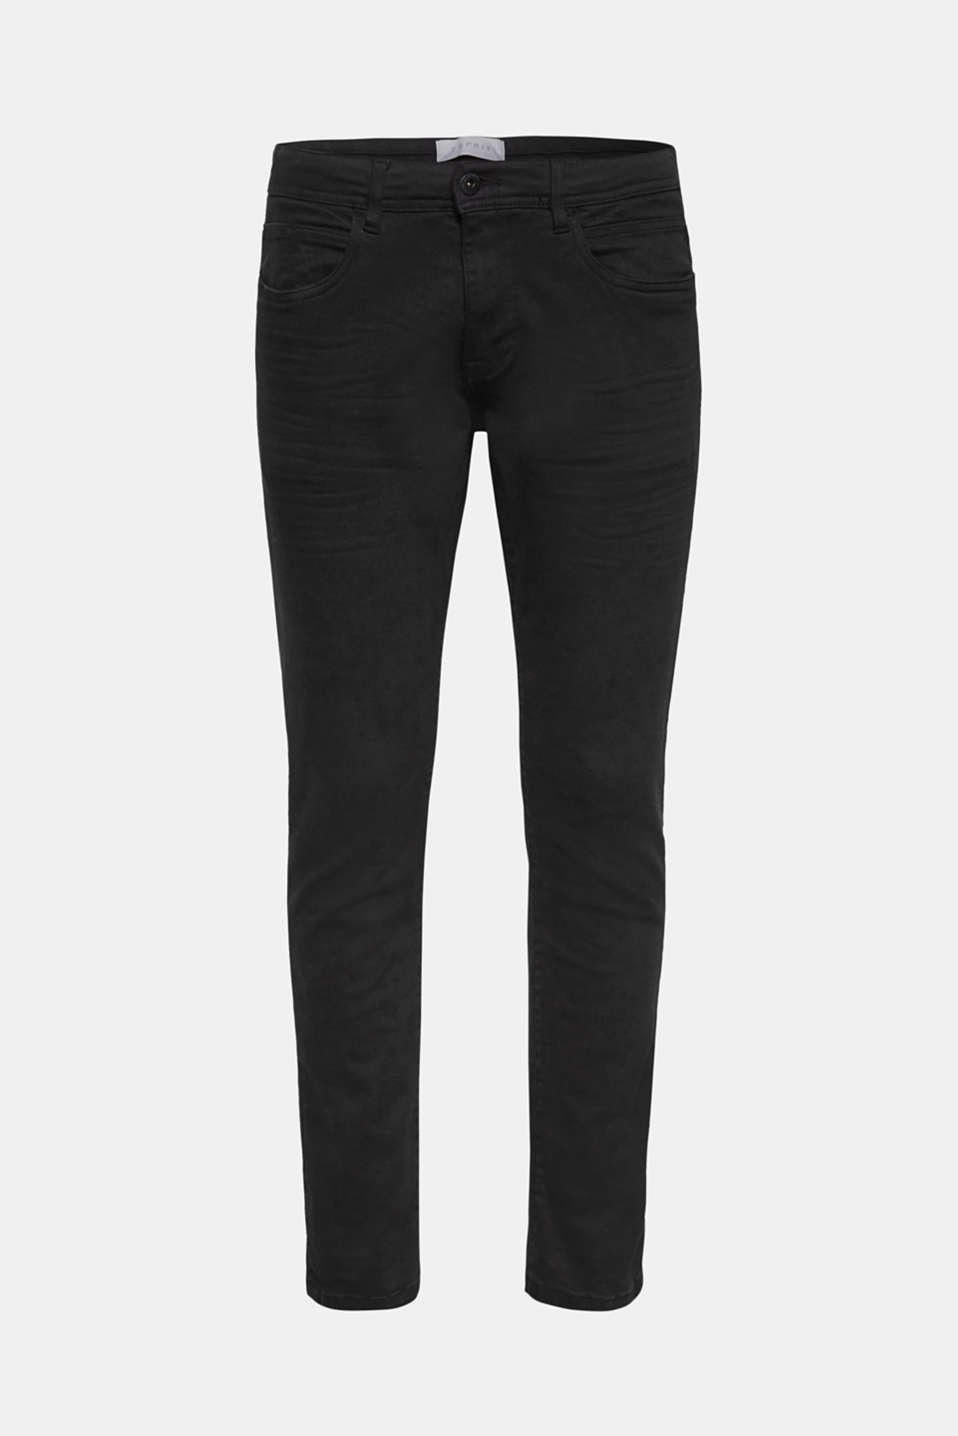 Esprit Skinny fit at our Online Shop